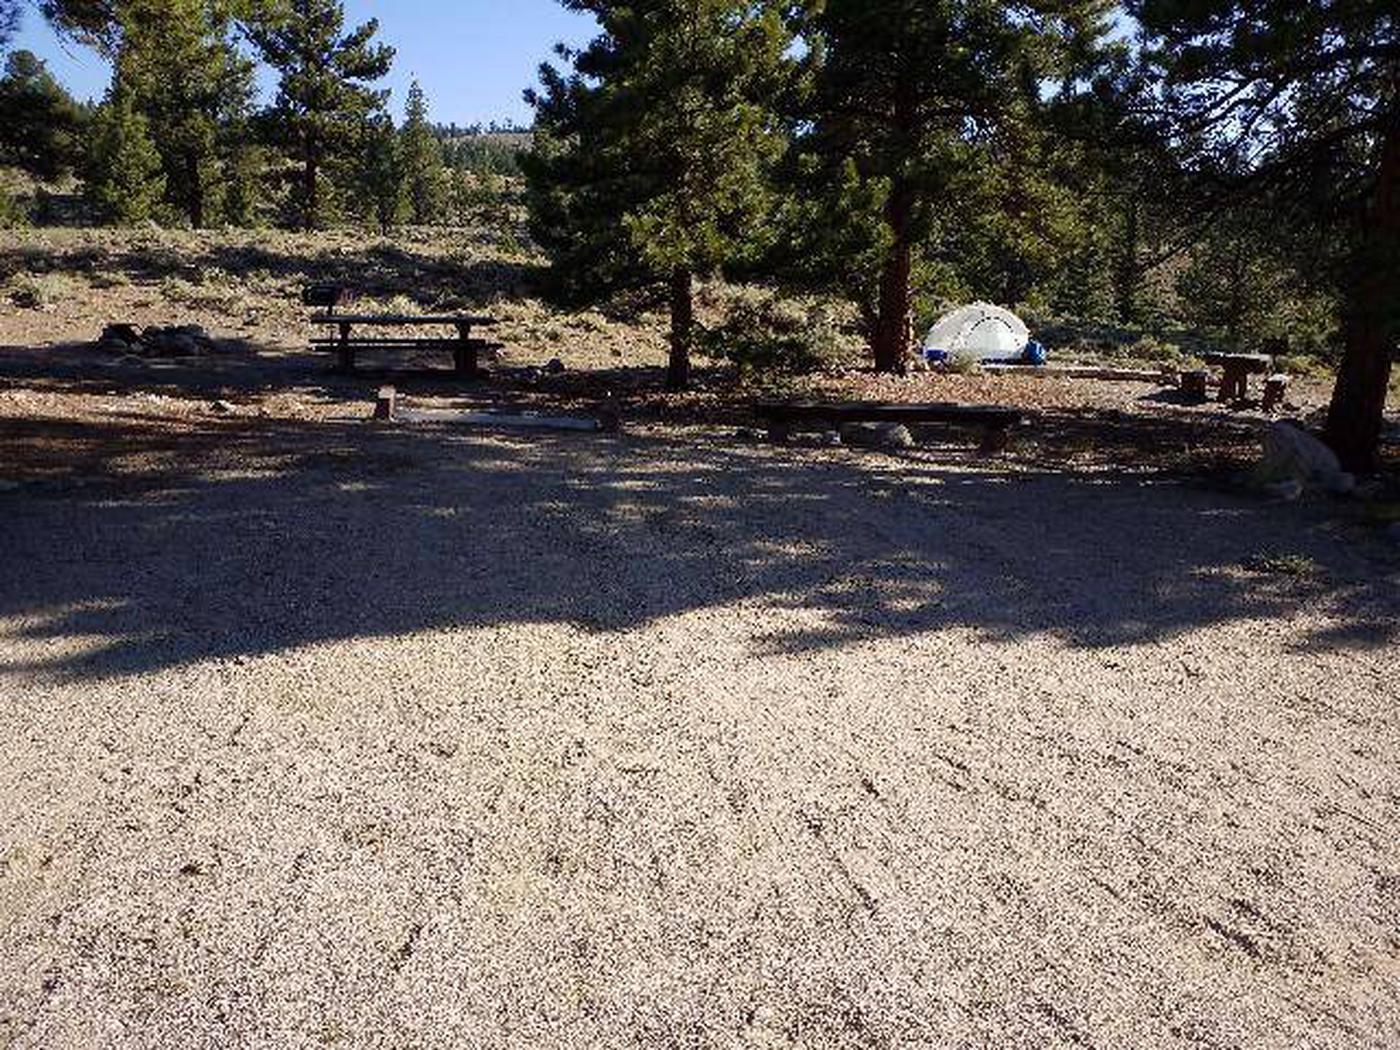 White Star Campground, site 49 parking